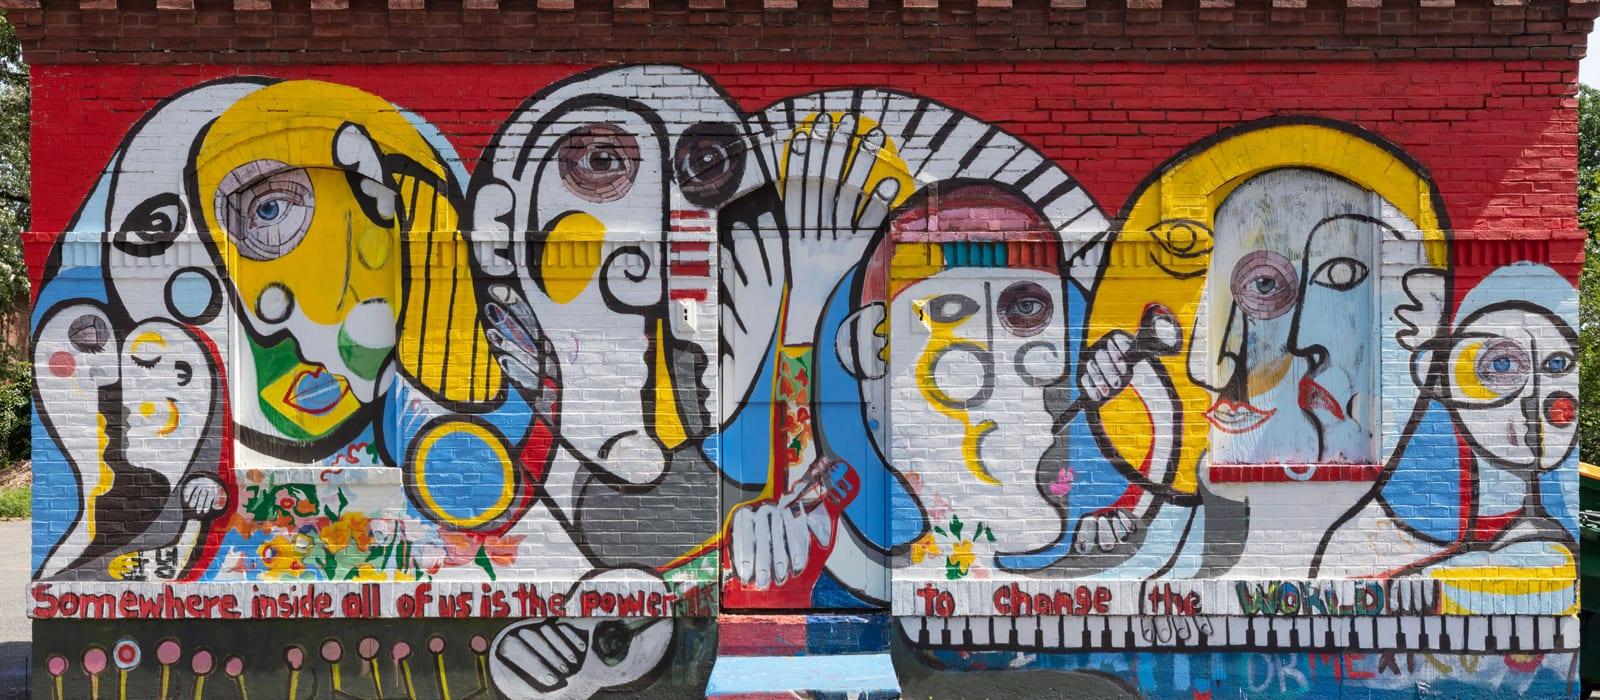 Mural outside modern apartments for rent in Framingham, MA